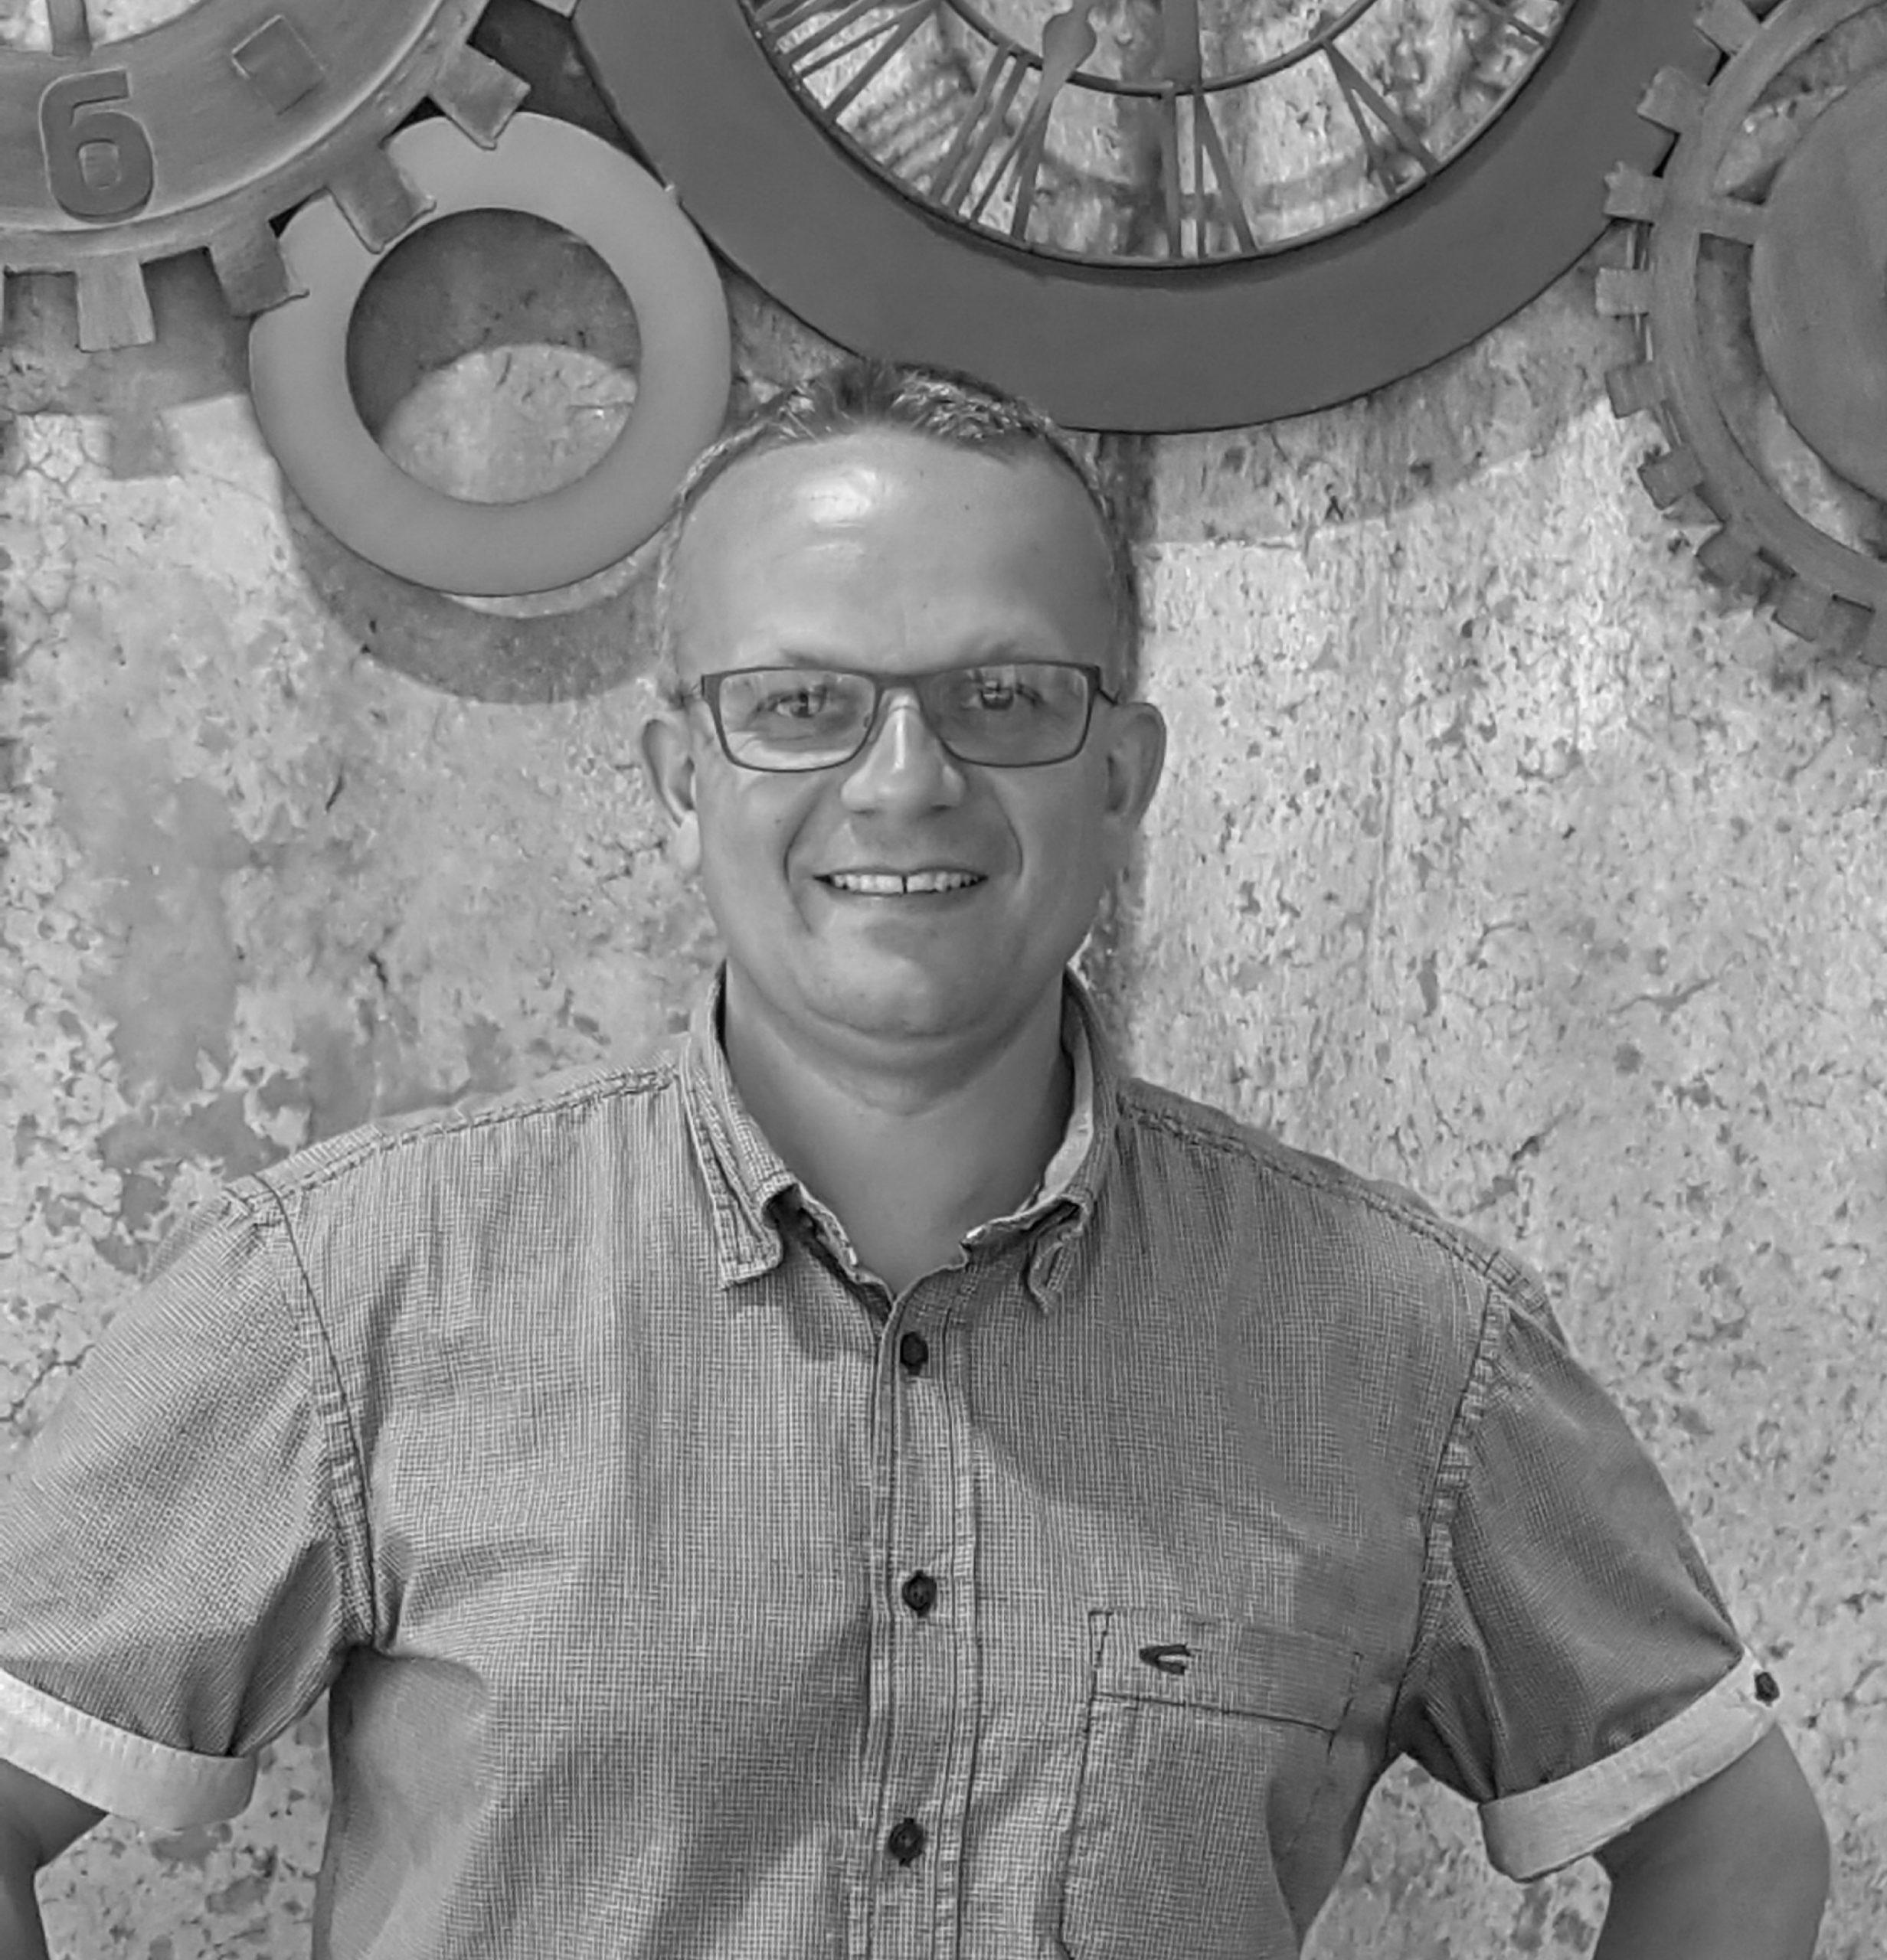 Rainer Maus